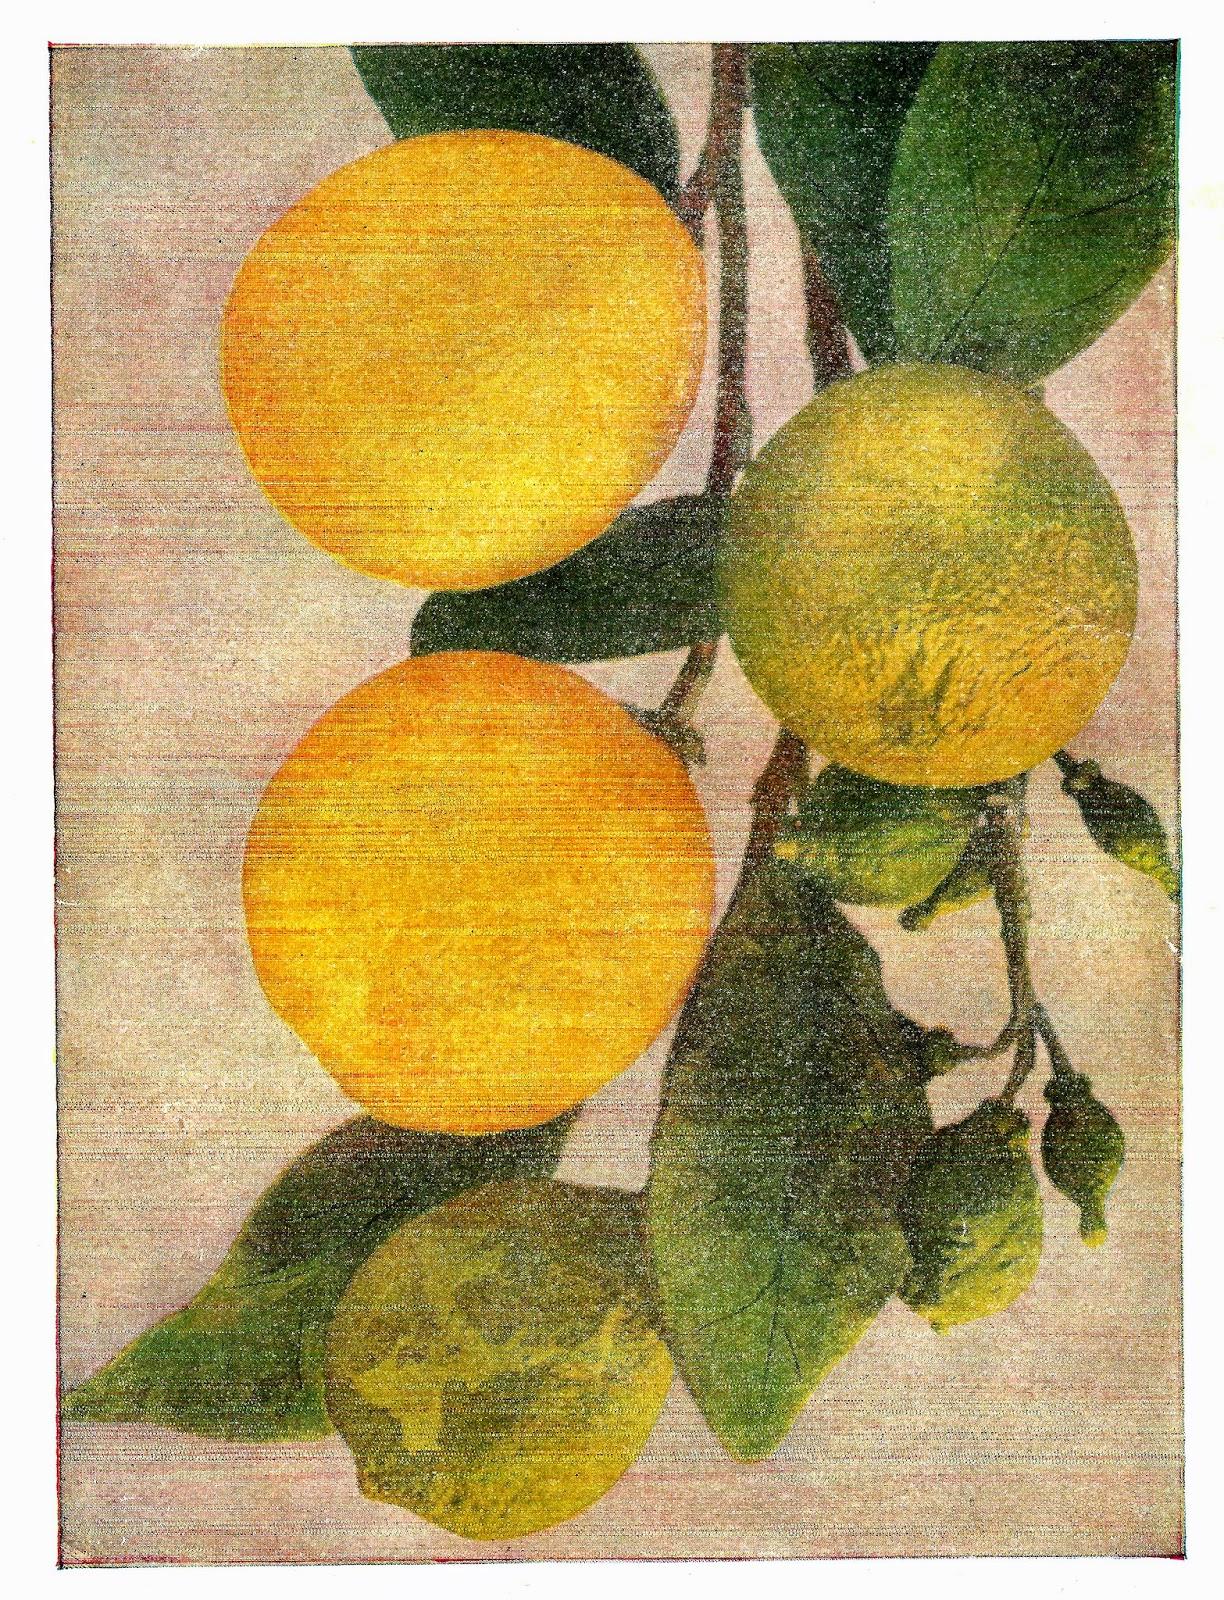 http://3.bp.blogspot.com/-NT9PGgNlgB4/U6SEeUZ4_vI/AAAAAAAAUdw/mIuOgtaeBOQ/s1600/lemons_branch.jpg